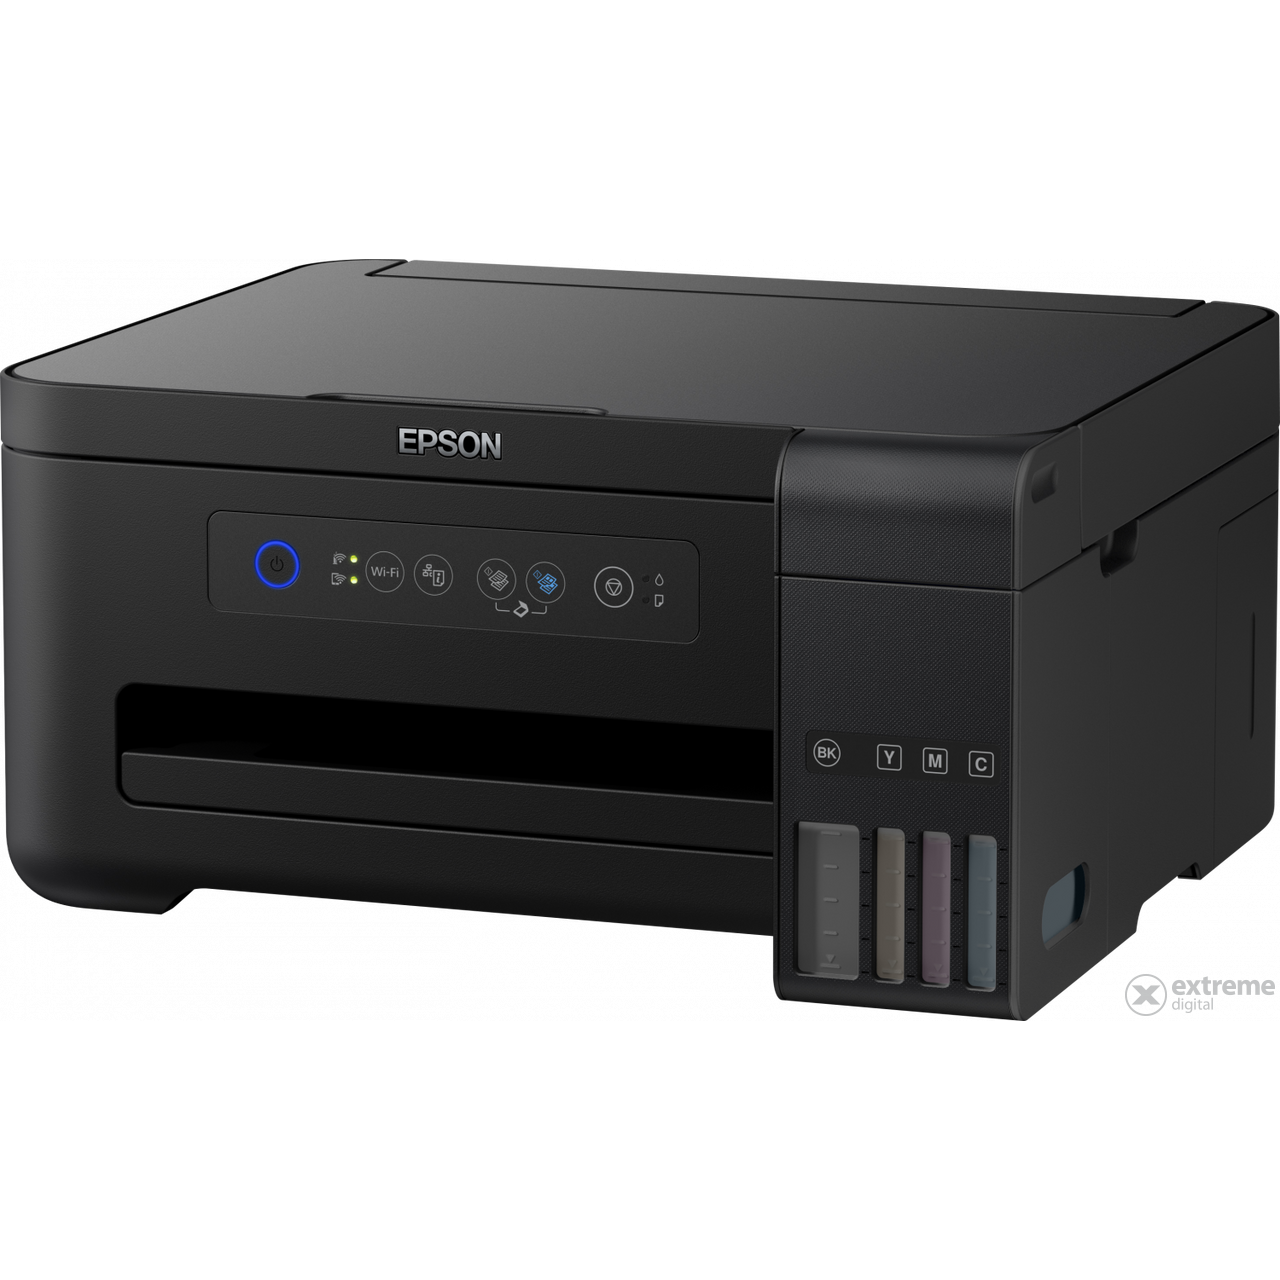 imprimanta epson ecotank premium design l4150 wi fi direct extreme digital. Black Bedroom Furniture Sets. Home Design Ideas